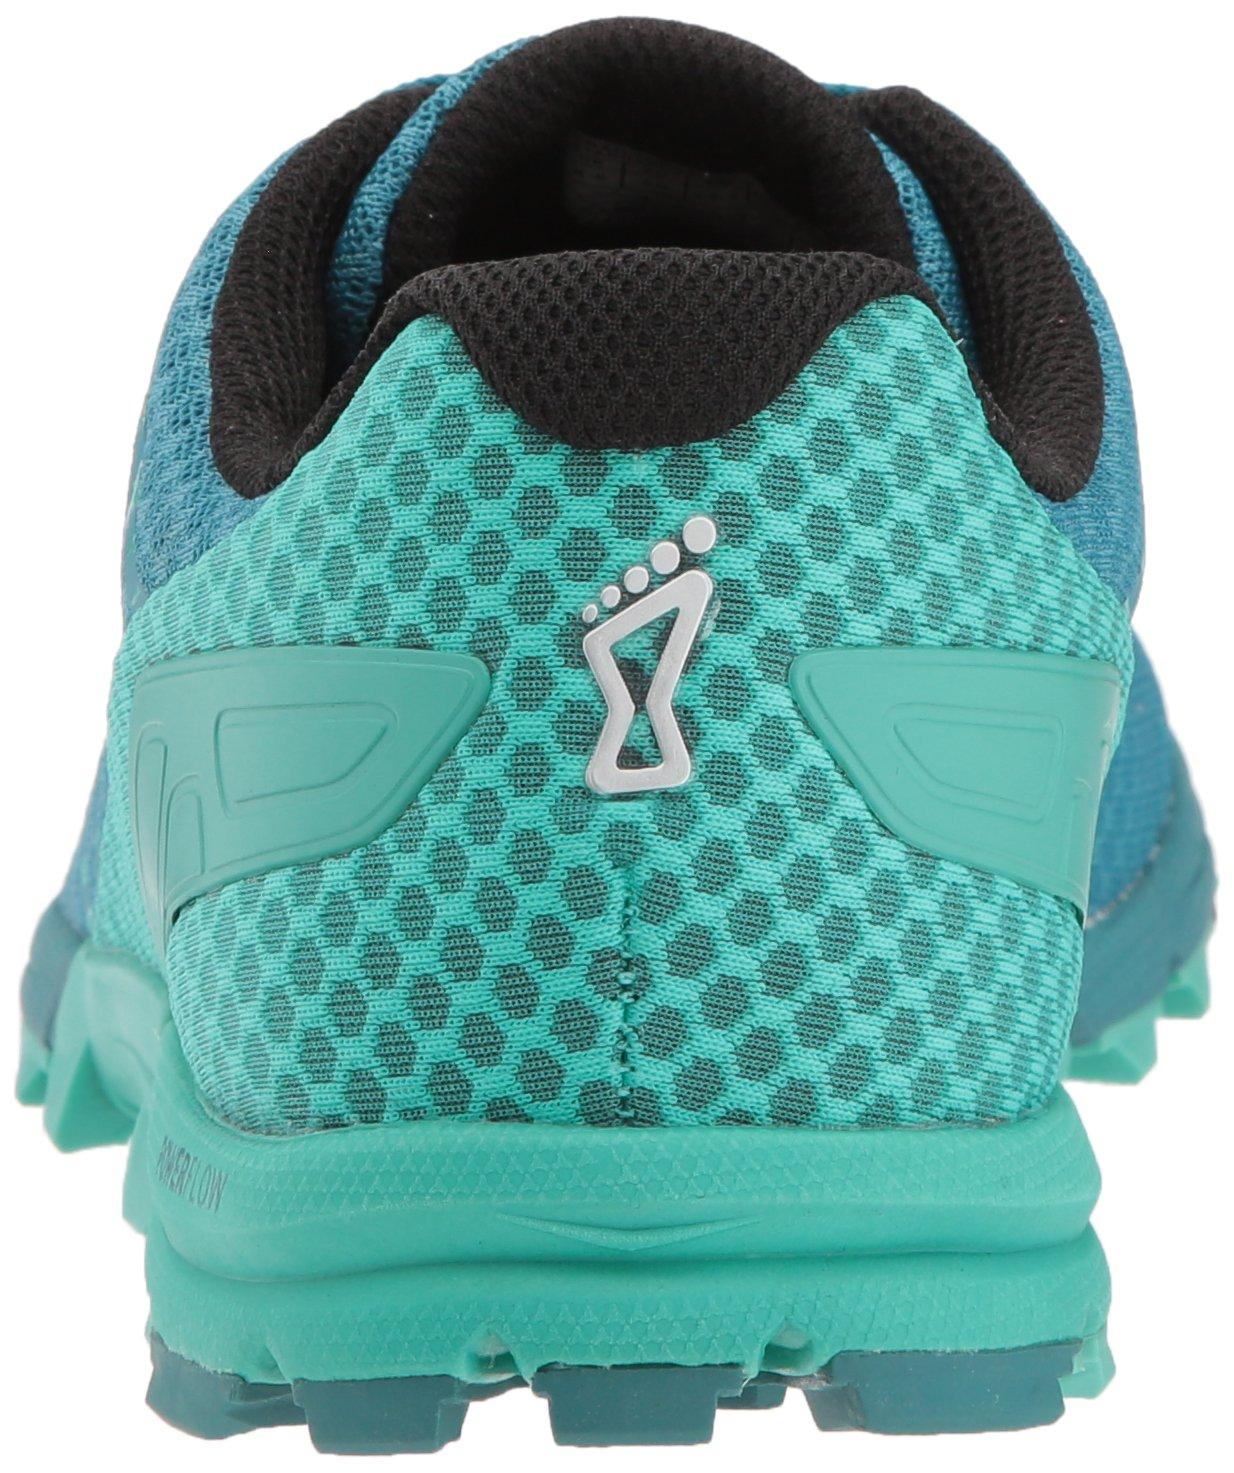 Inov-8 Women's Trailtalon 235 (W) Trail M Running Shoe B073VSF97Y 5.5 M Trail US|Teal 97883a